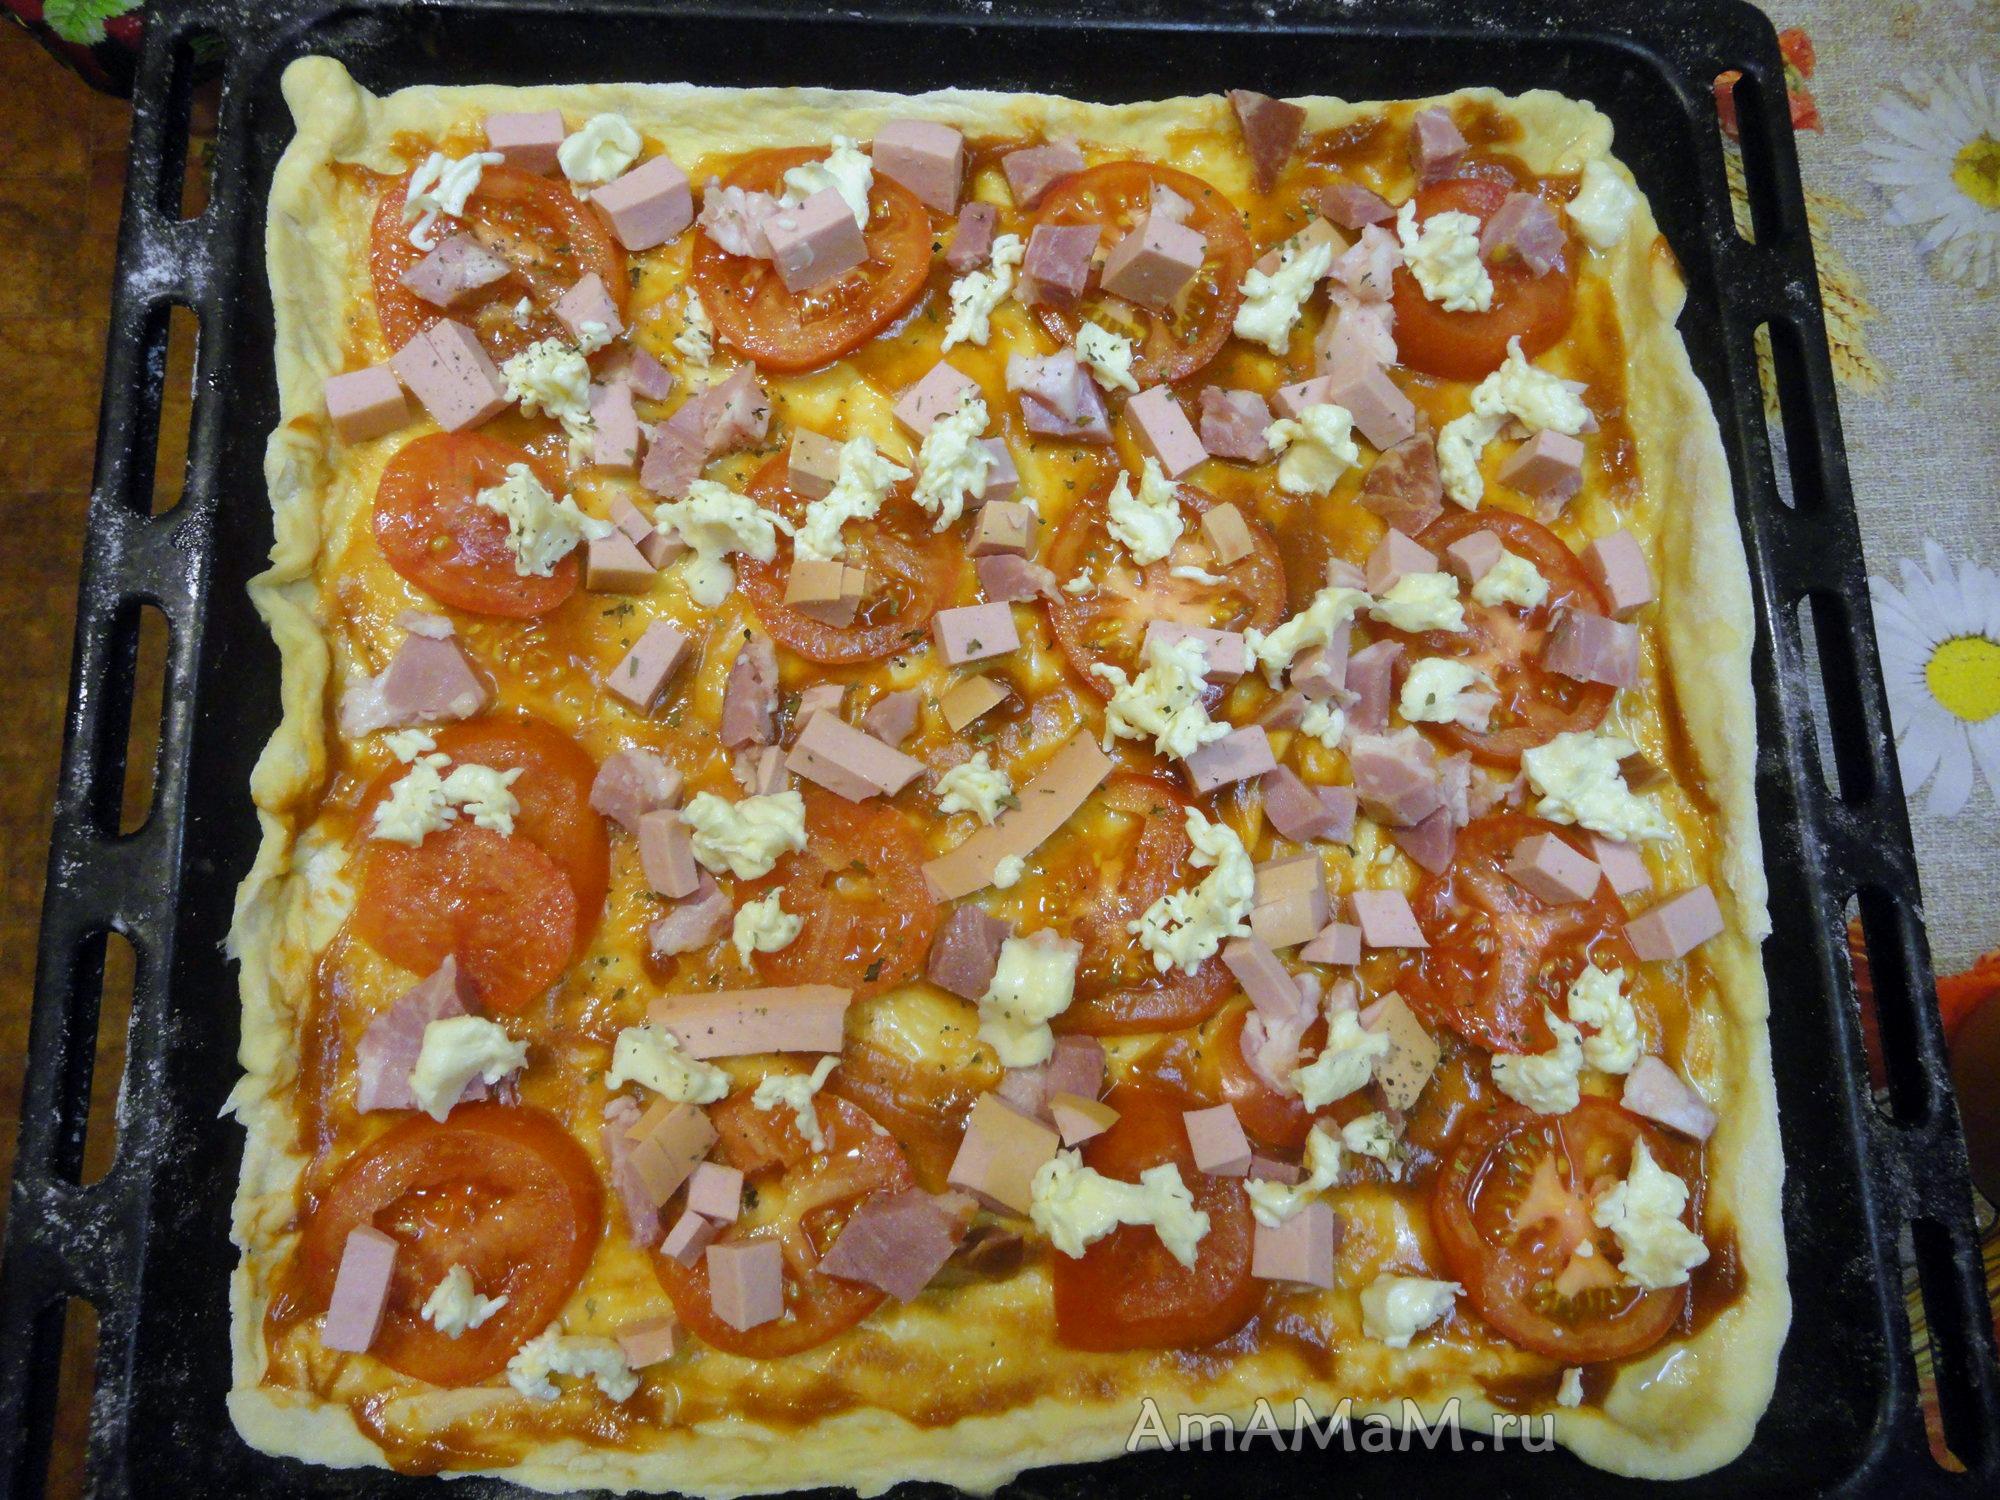 Пицца в домашних условиях в духовке с фото 458